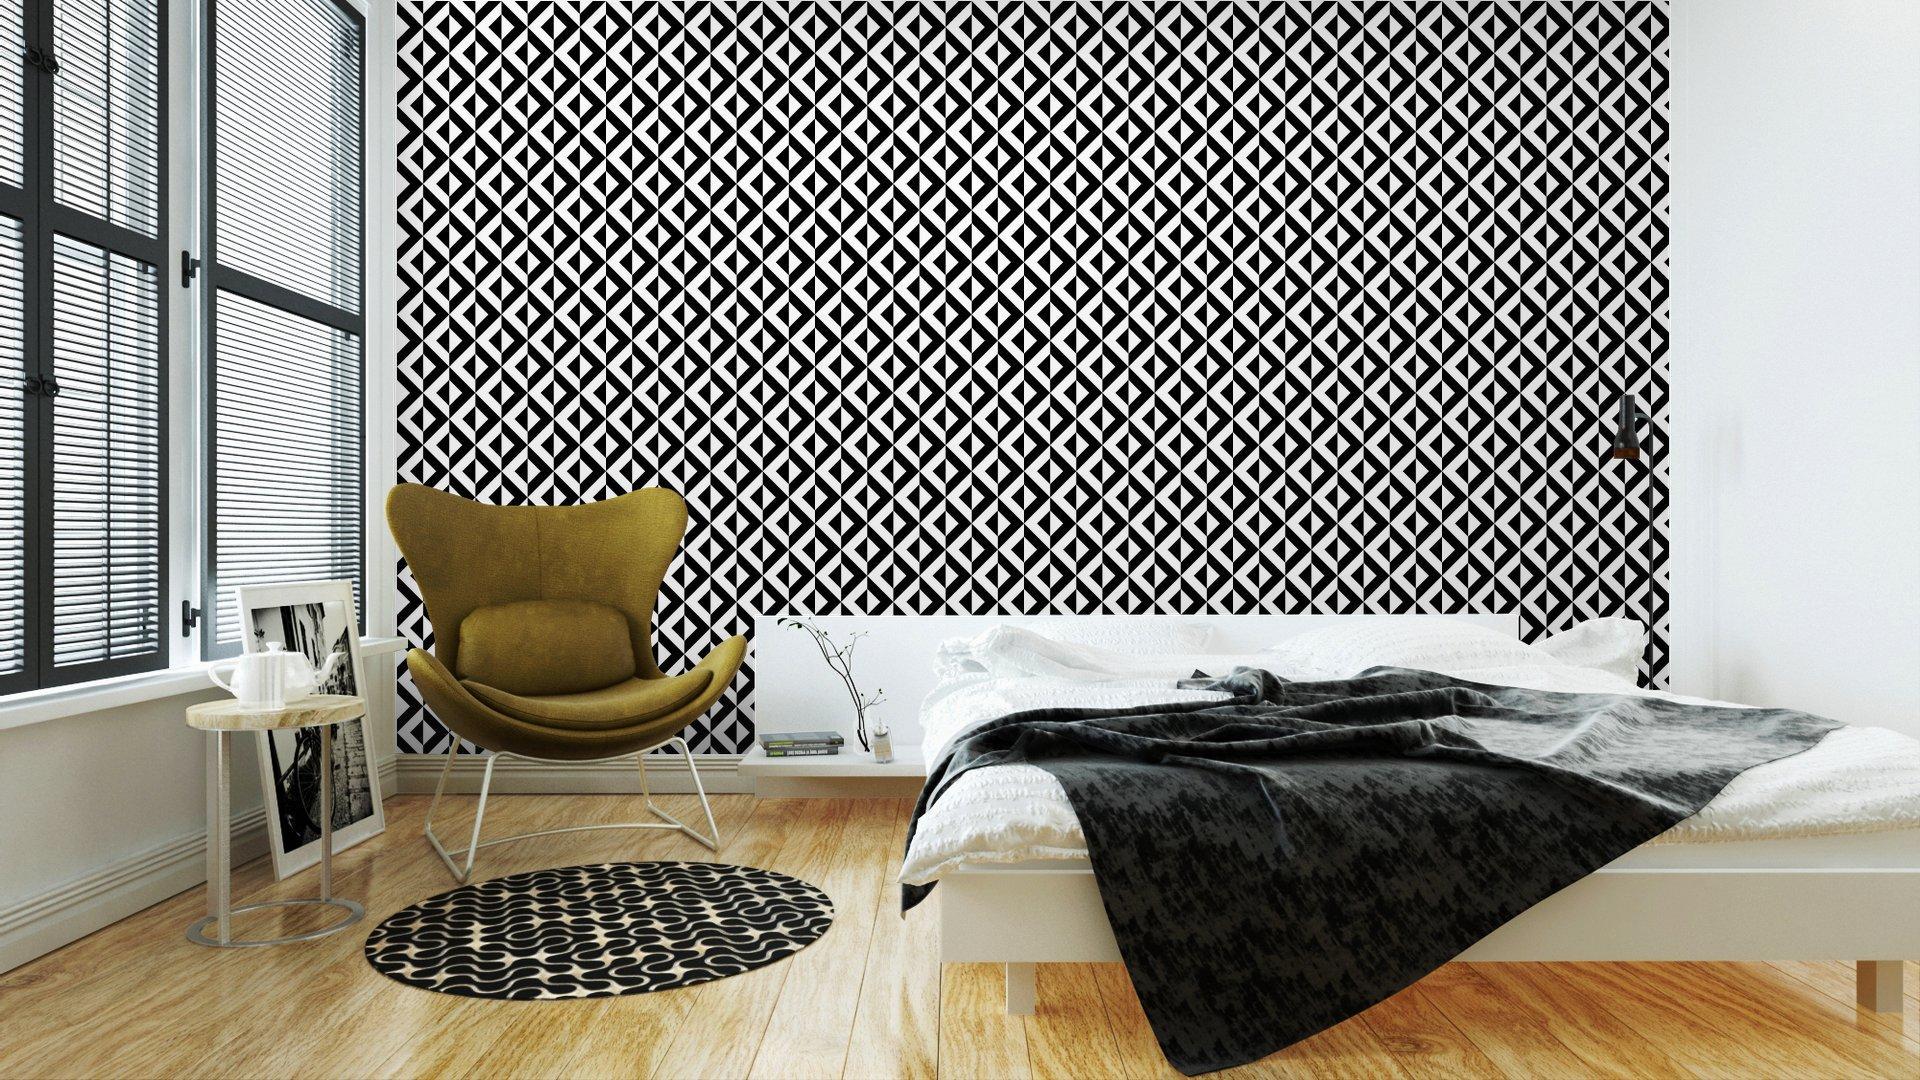 Fotomurales mexico papeles pintados patron geometrico abstracto 3 - Papel Tapiz Geométrico Blanco y Negro 01